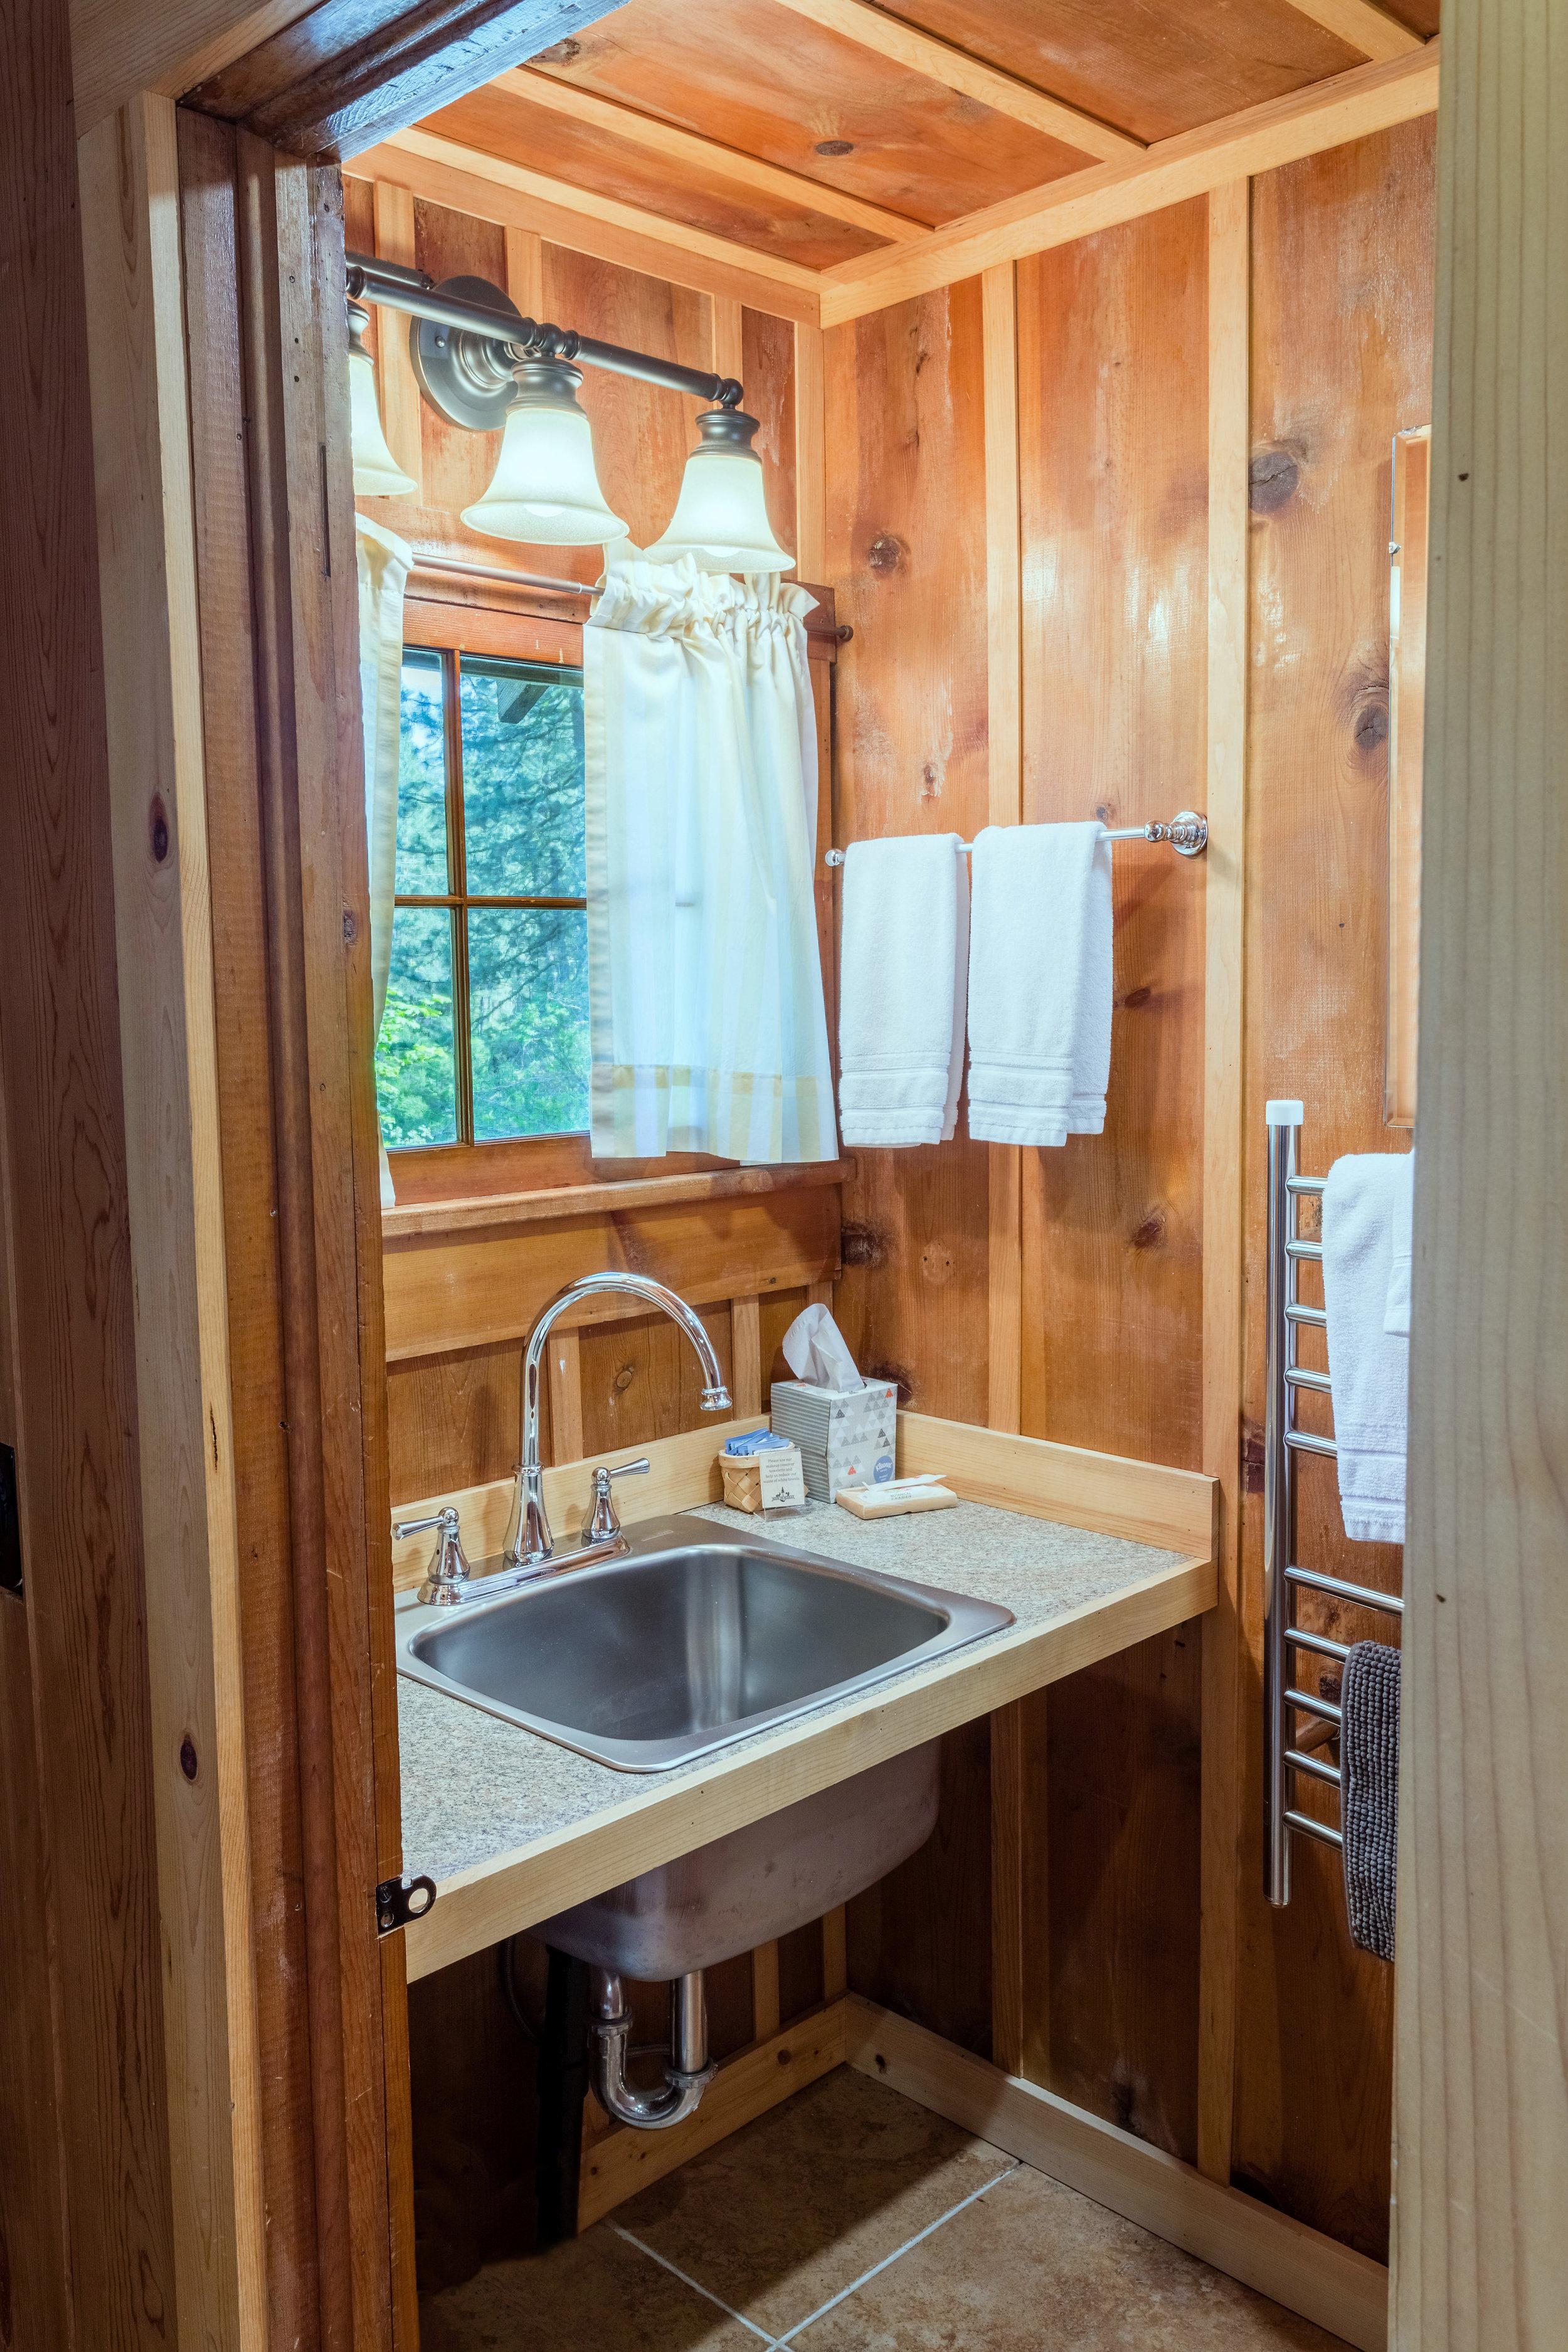 Eleanor Kitchen Bathroom Nord1433.jpg